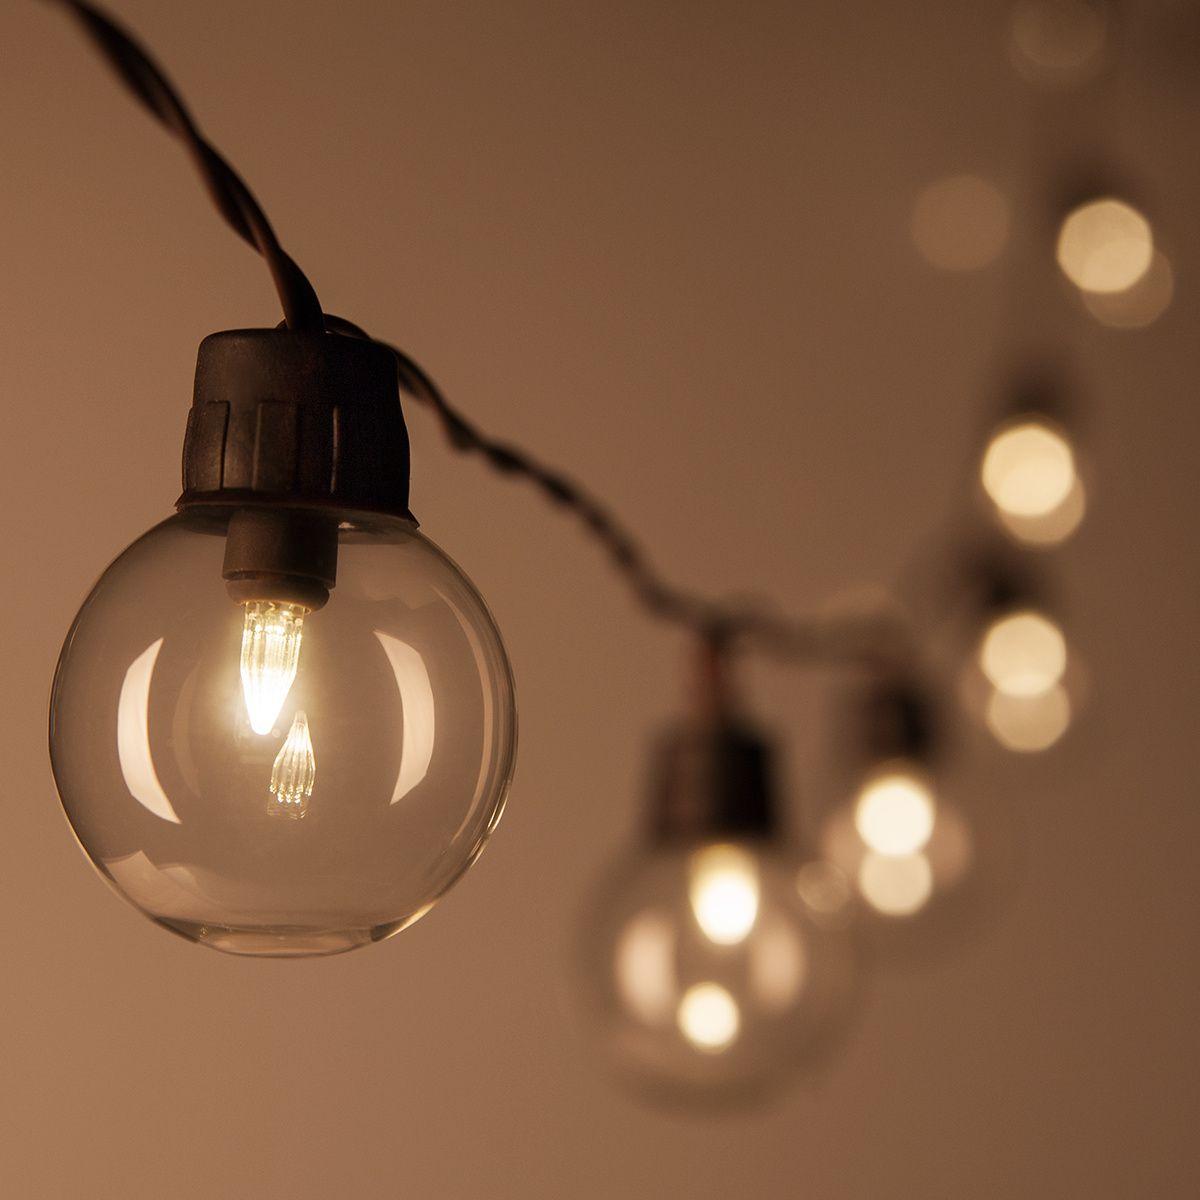 Solar Lights Make Decorating Easy! Let Mother Nature Make Your Garden Dazzle